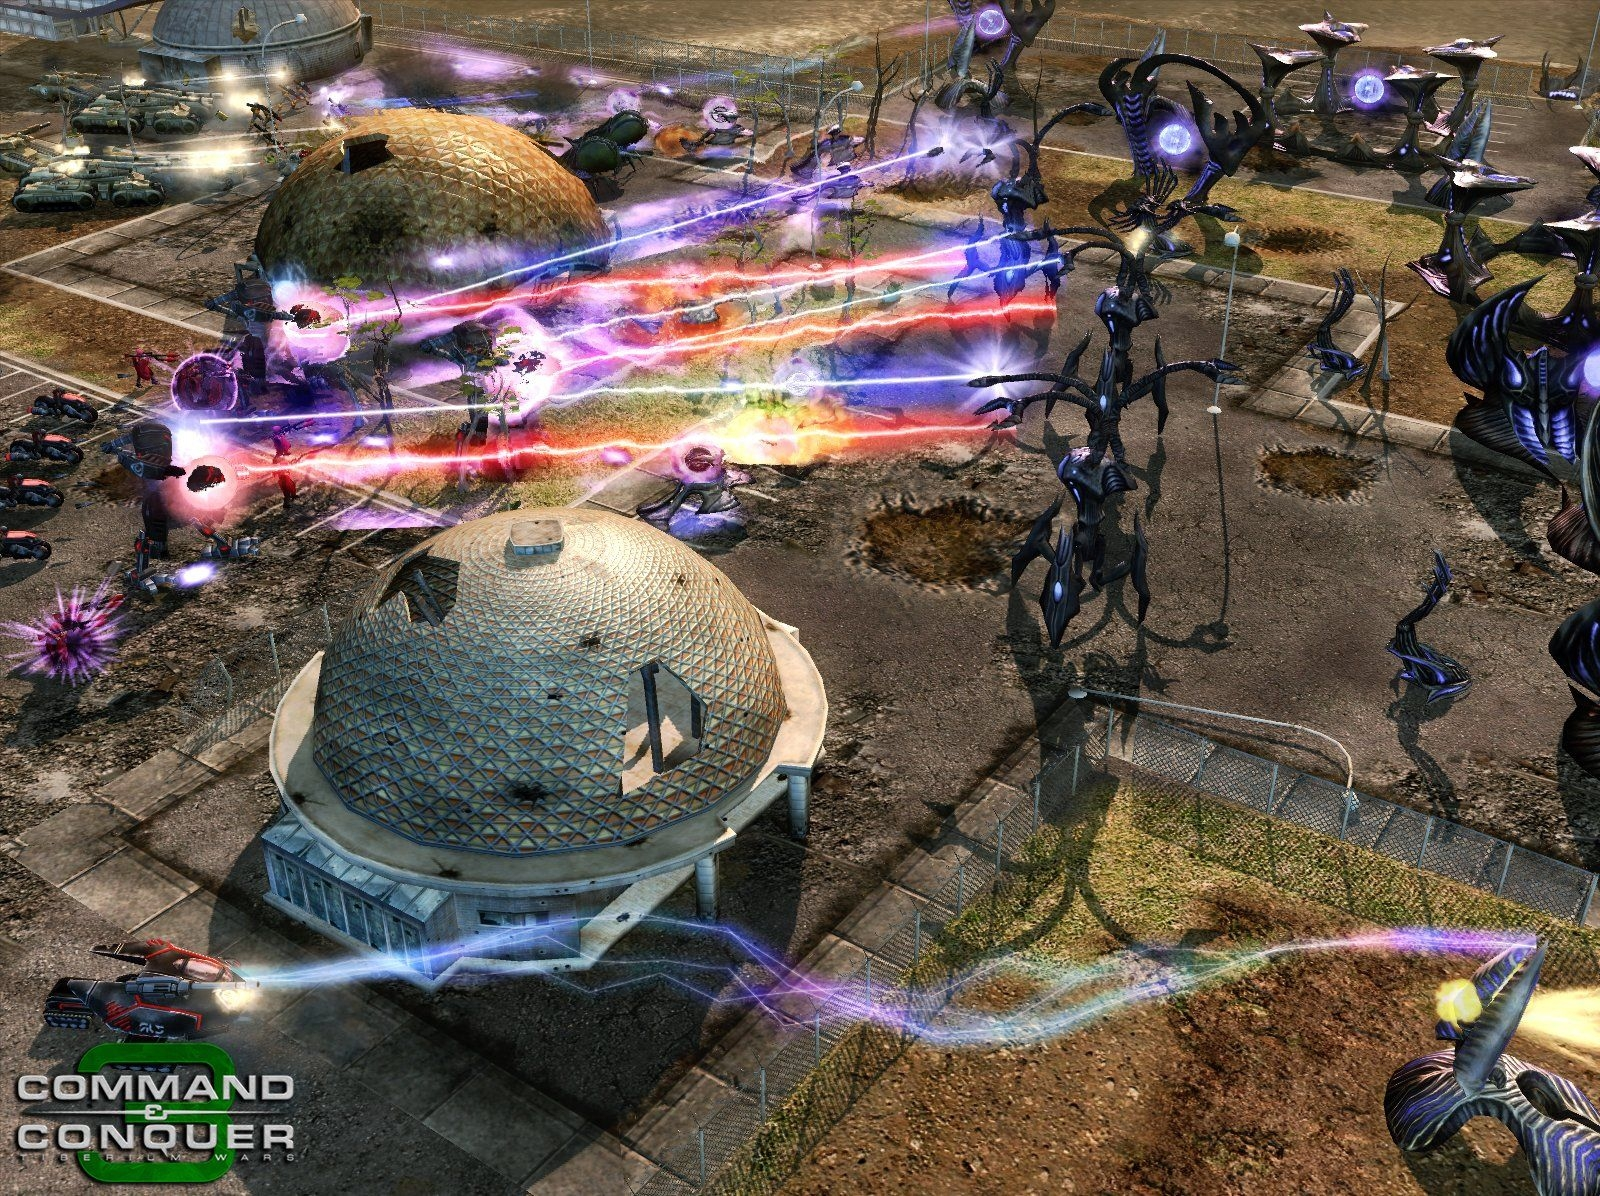 Command Conquer 3: Tiberium Crysis/Командуй И Побеждай 3 Кризис Тиберии Игру Для Pc